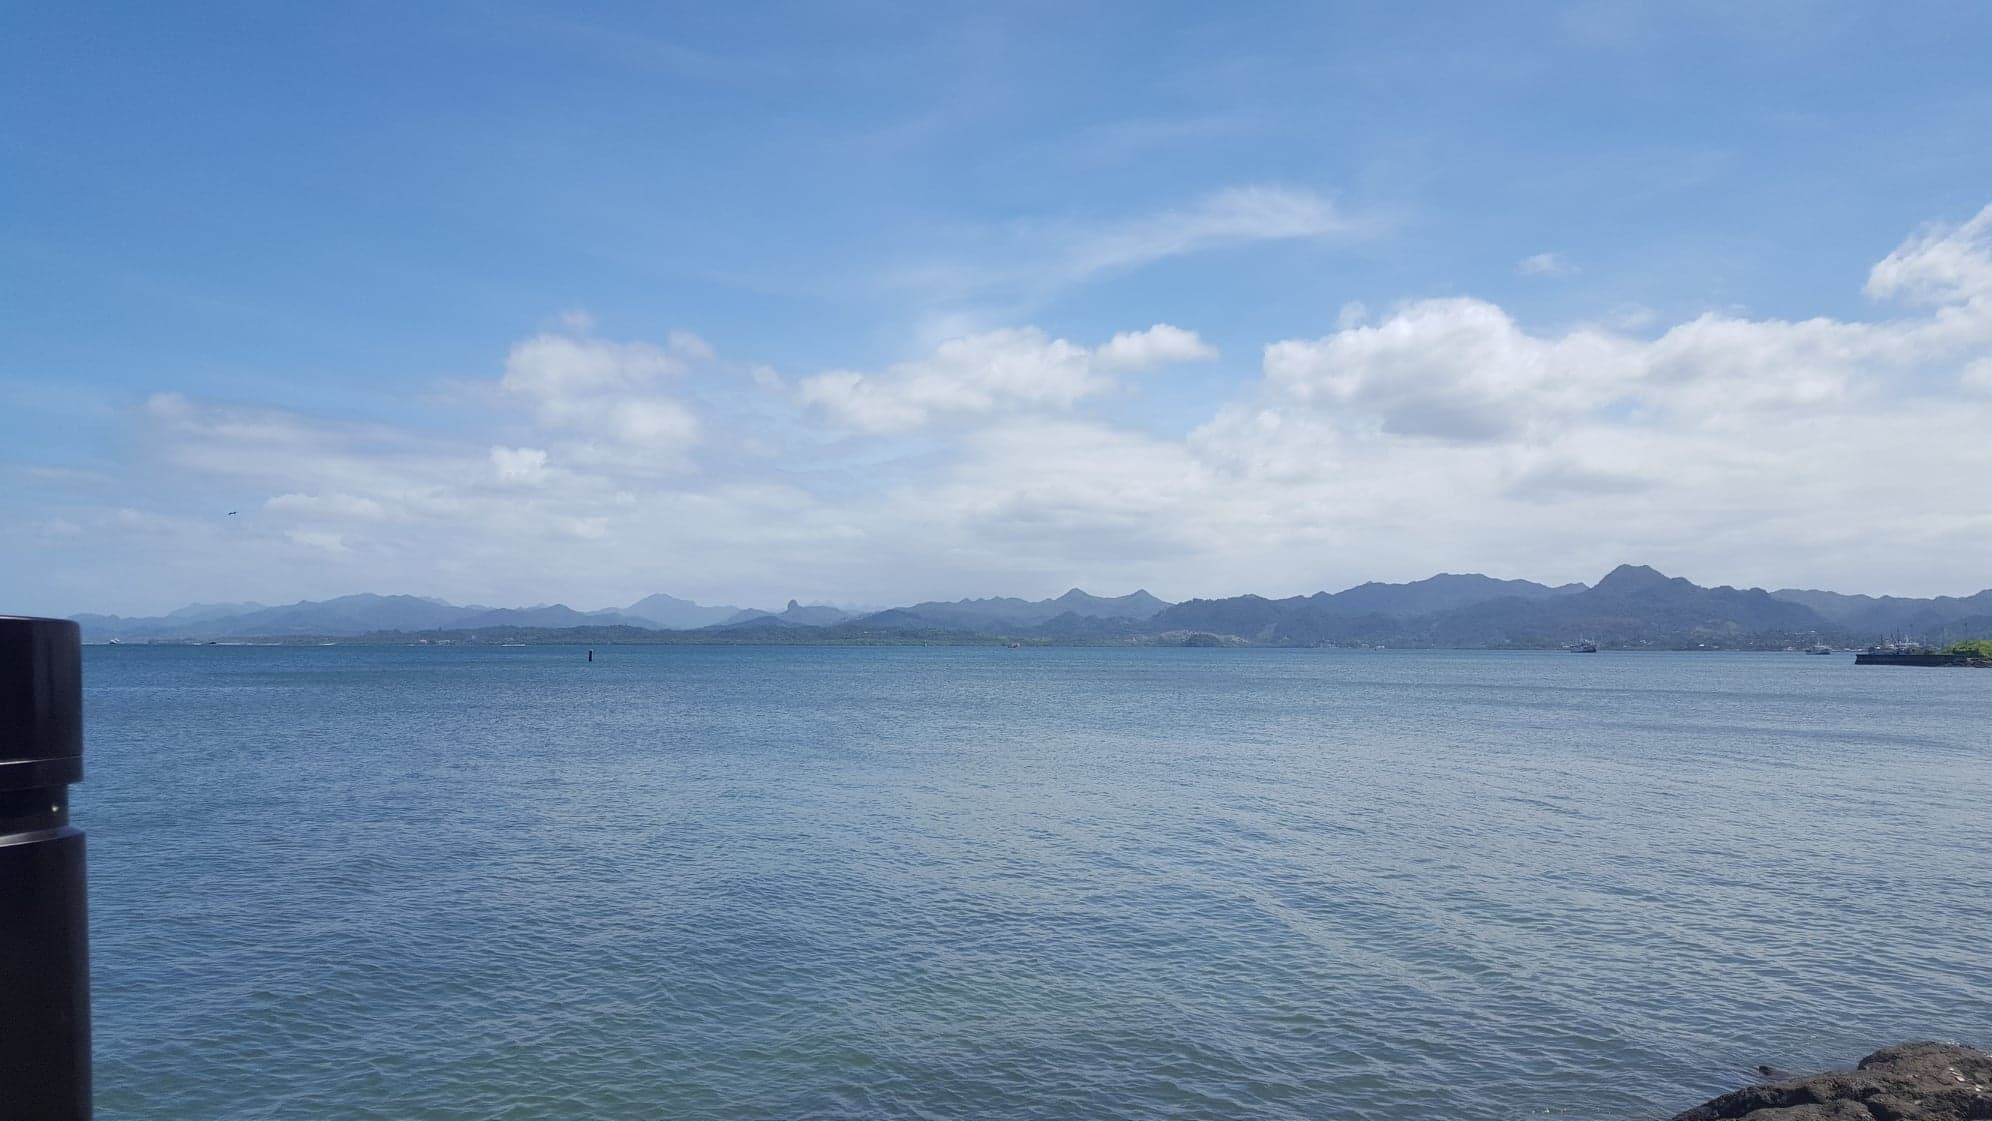 The beauty of the South Seas. Photo credit Hery Ramambasoa.